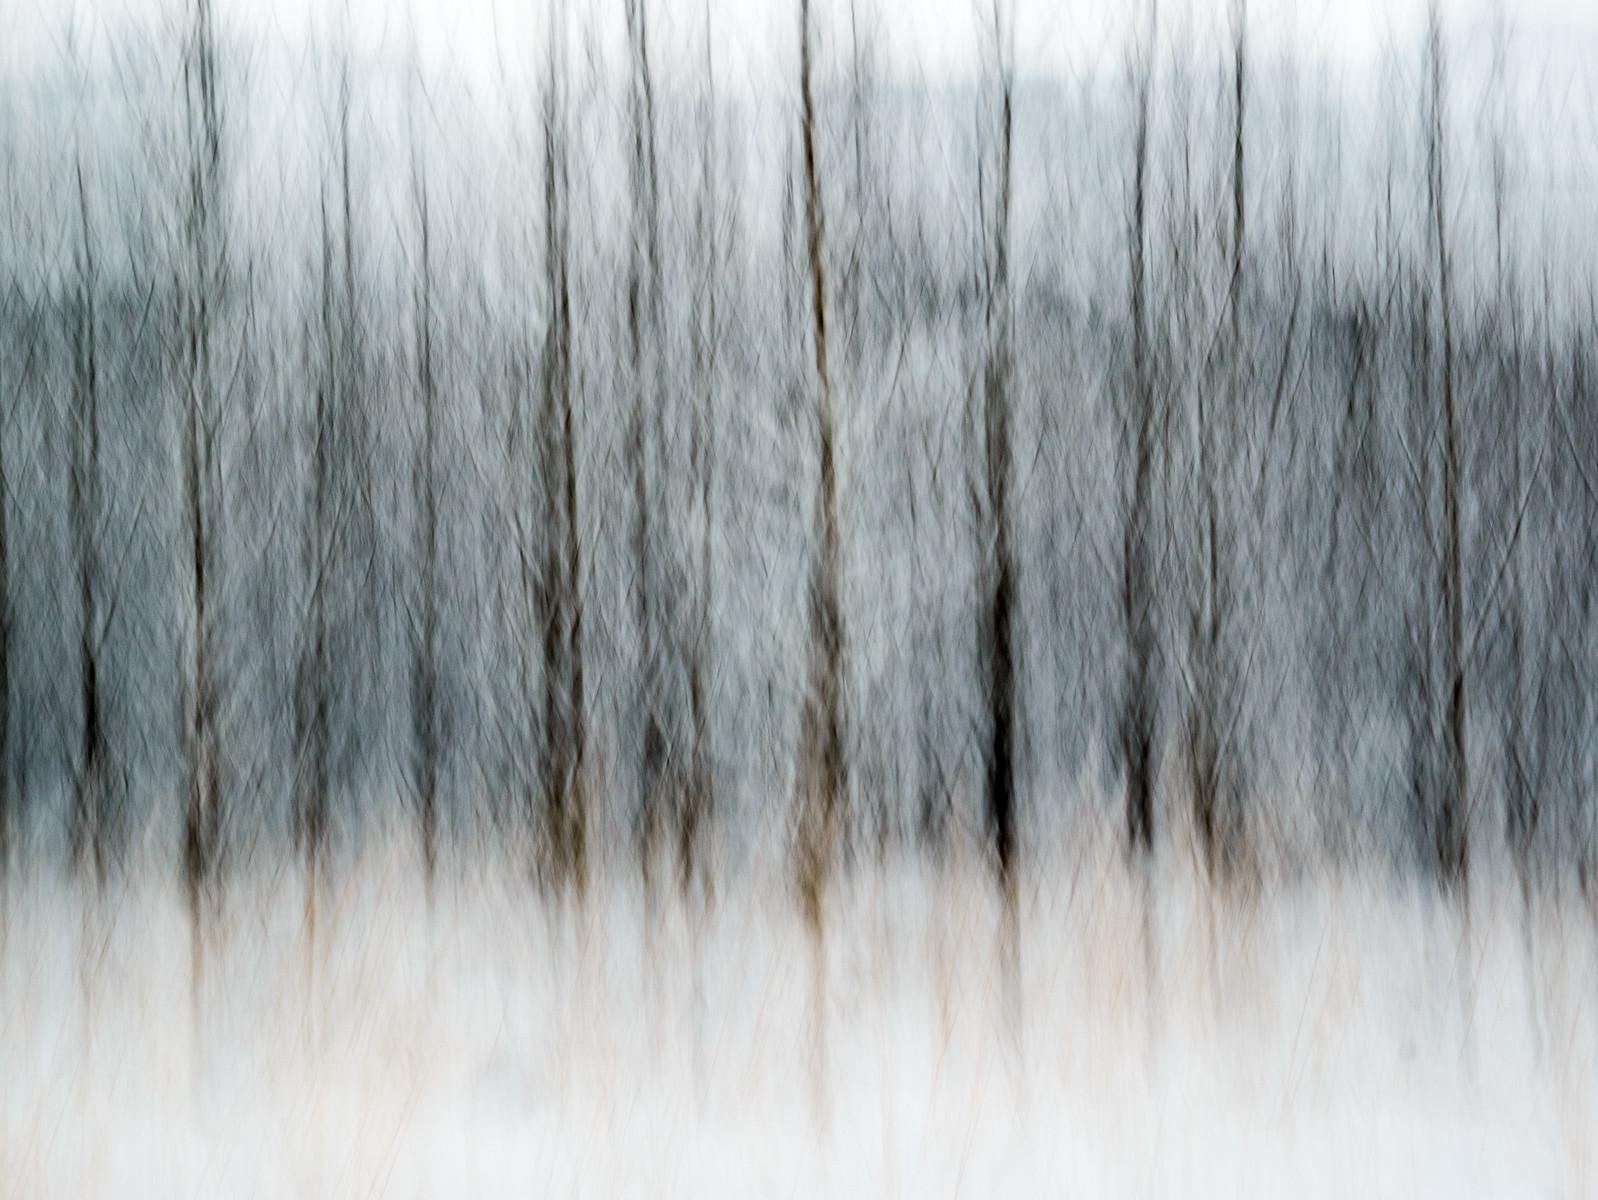 muench-workshops-iceland-winter-6.jpg